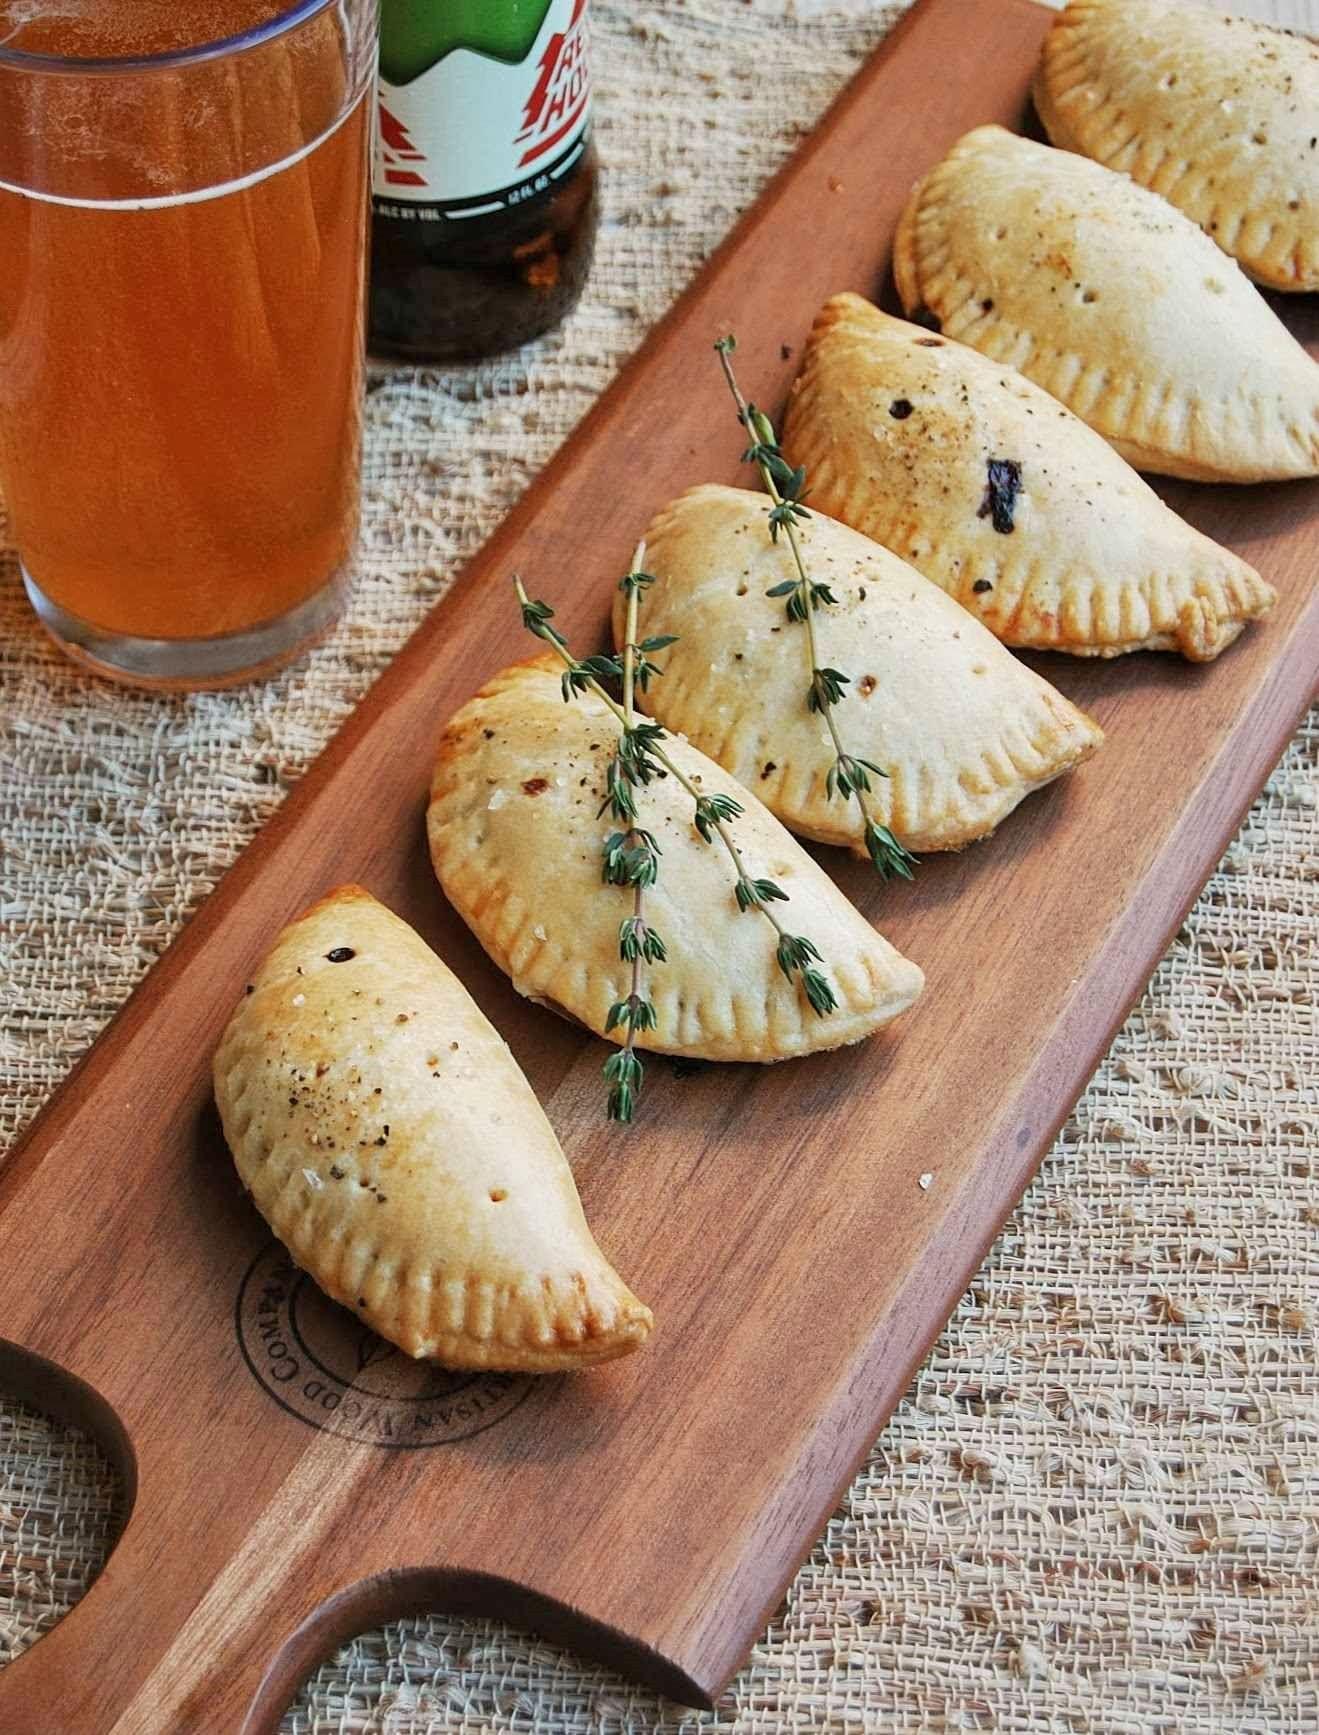 Mushroom, gorgonzola, and caramelized onion hand pies - nice as mini appetizers!